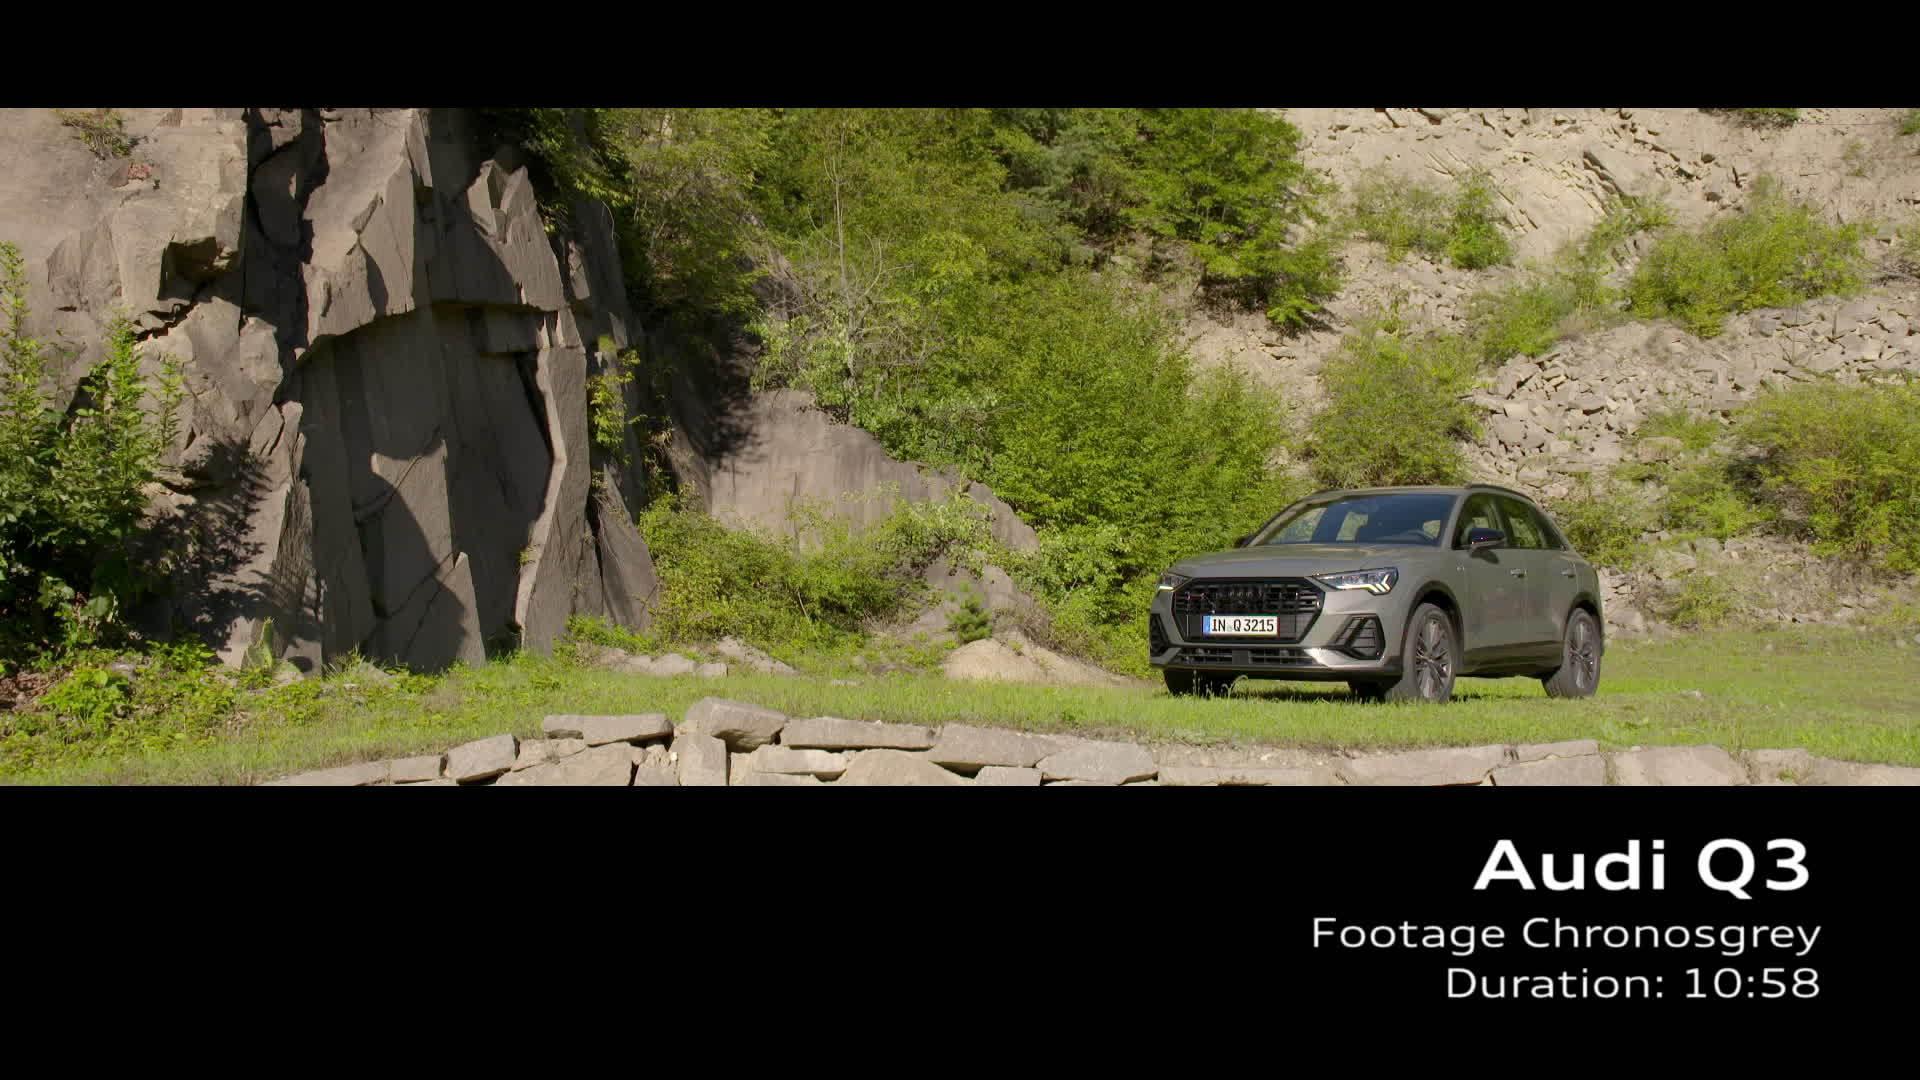 Audi Q3 Footage Chronosgrau (2018)